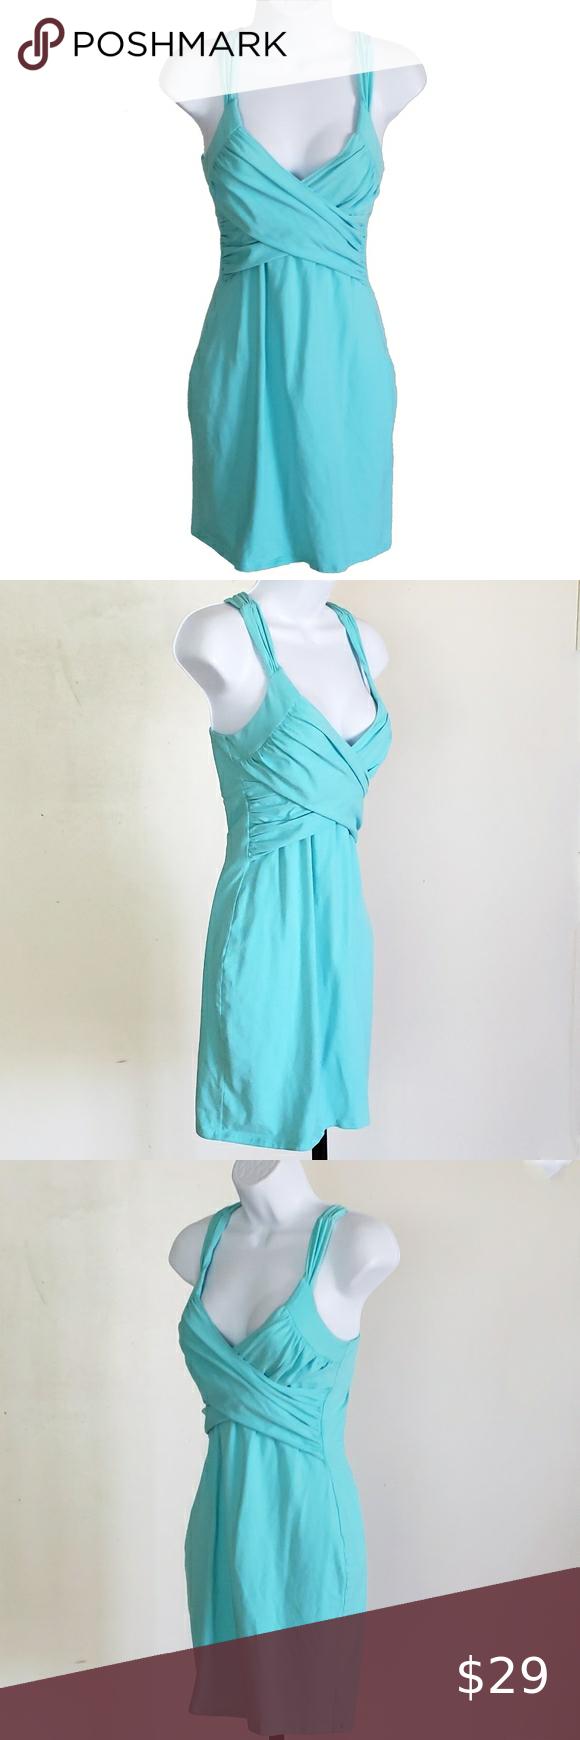 Sold Victoria S Secret Bra Tops Dress Stretch Xs Bra Top Dress Casual Dresses Dresses [ 1740 x 580 Pixel ]